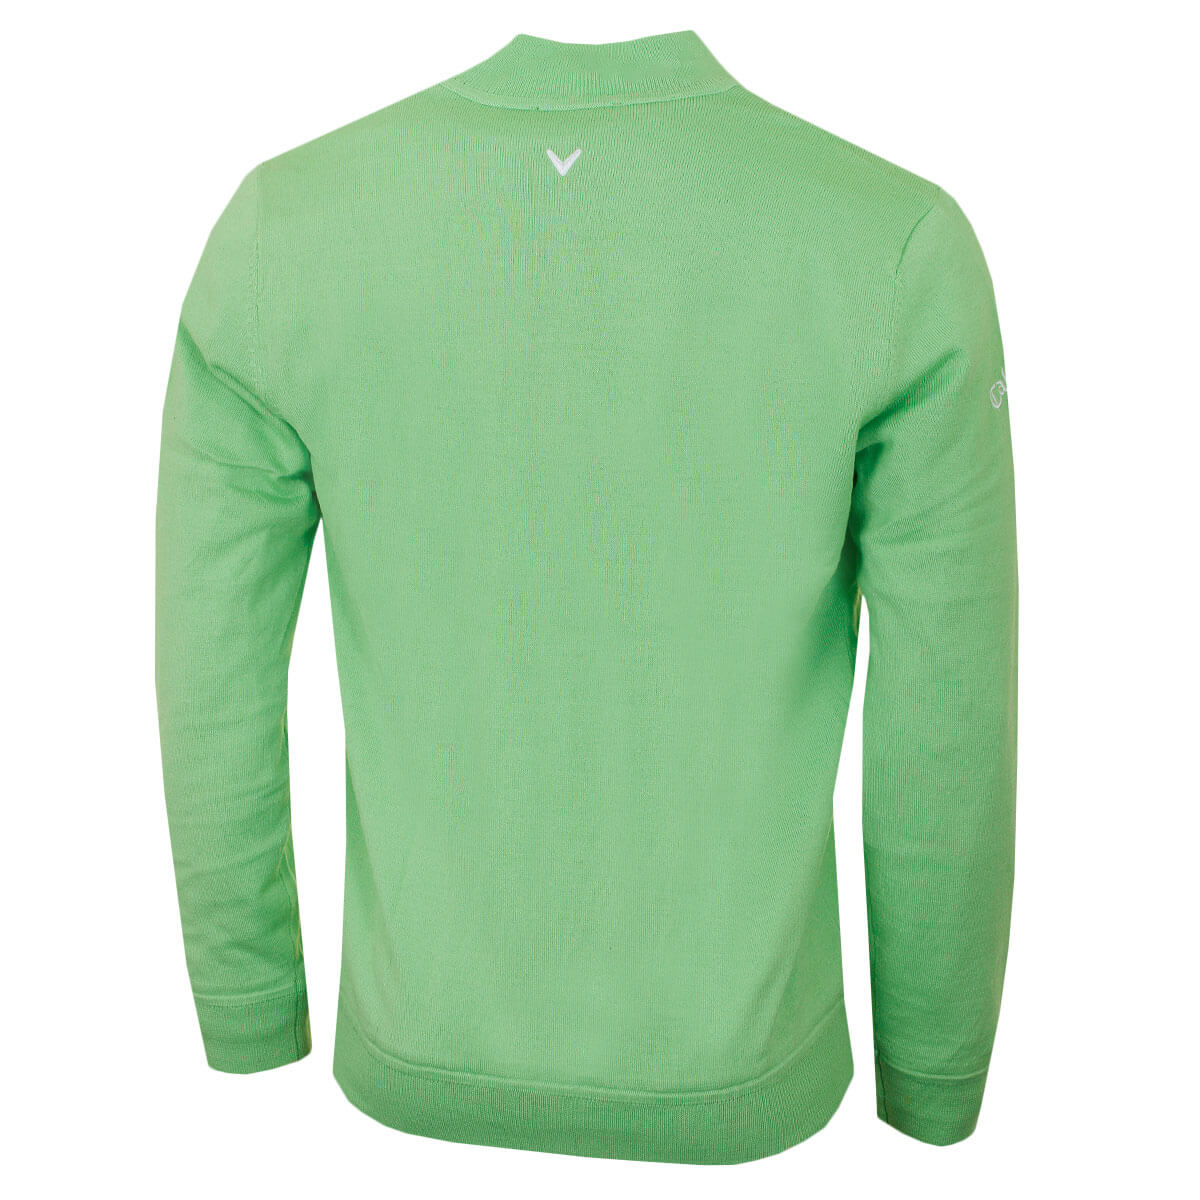 Callaway-Golf-Mens-1-4-Zip-Mock-Merino-Windproof-Sweater-Pullover-49-OFF-RRP thumbnail 9